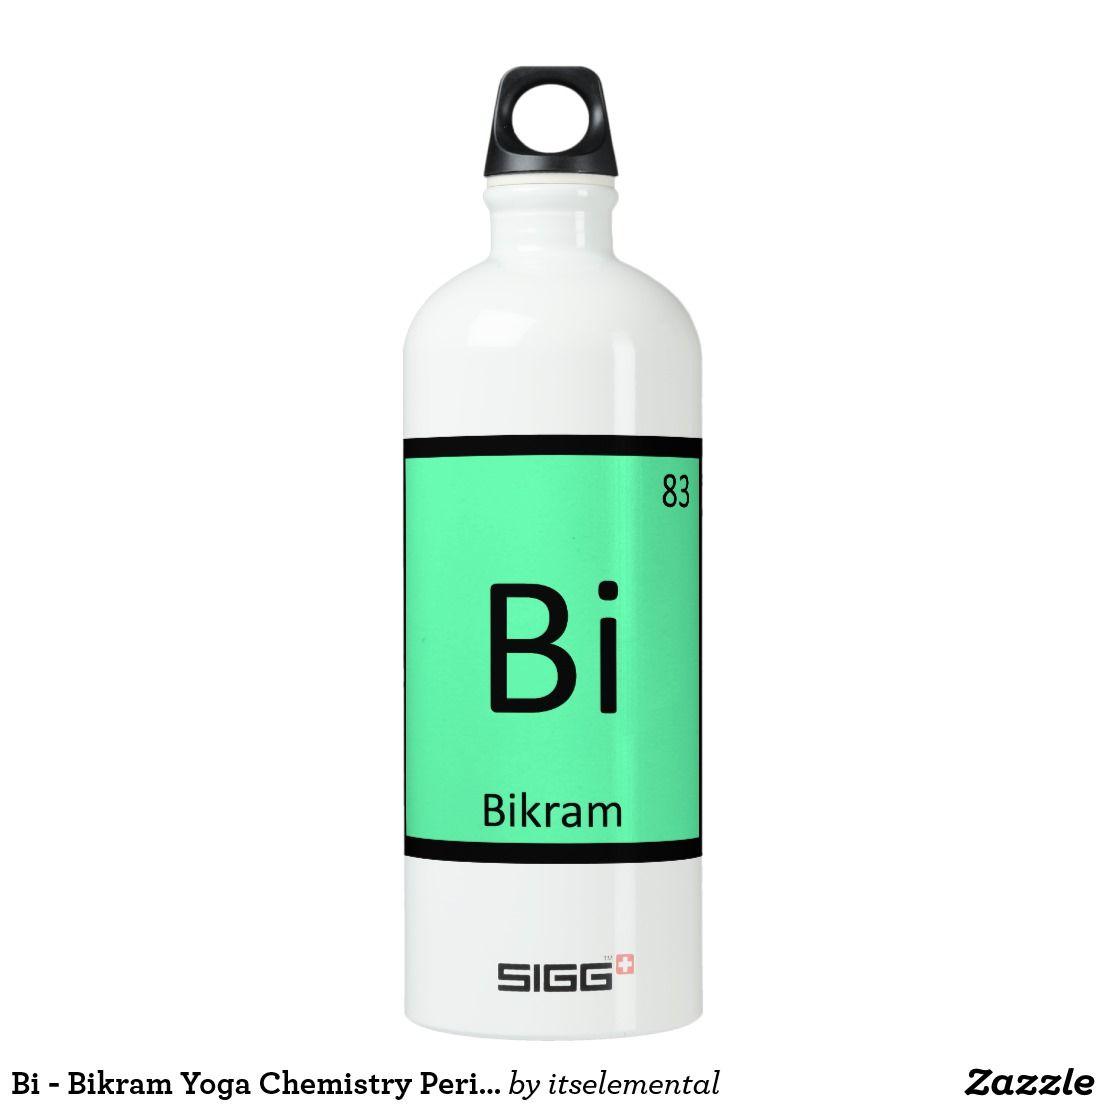 Bi Bikram Yoga Chemistry Periodic Table Symbol Custom Yoga Water